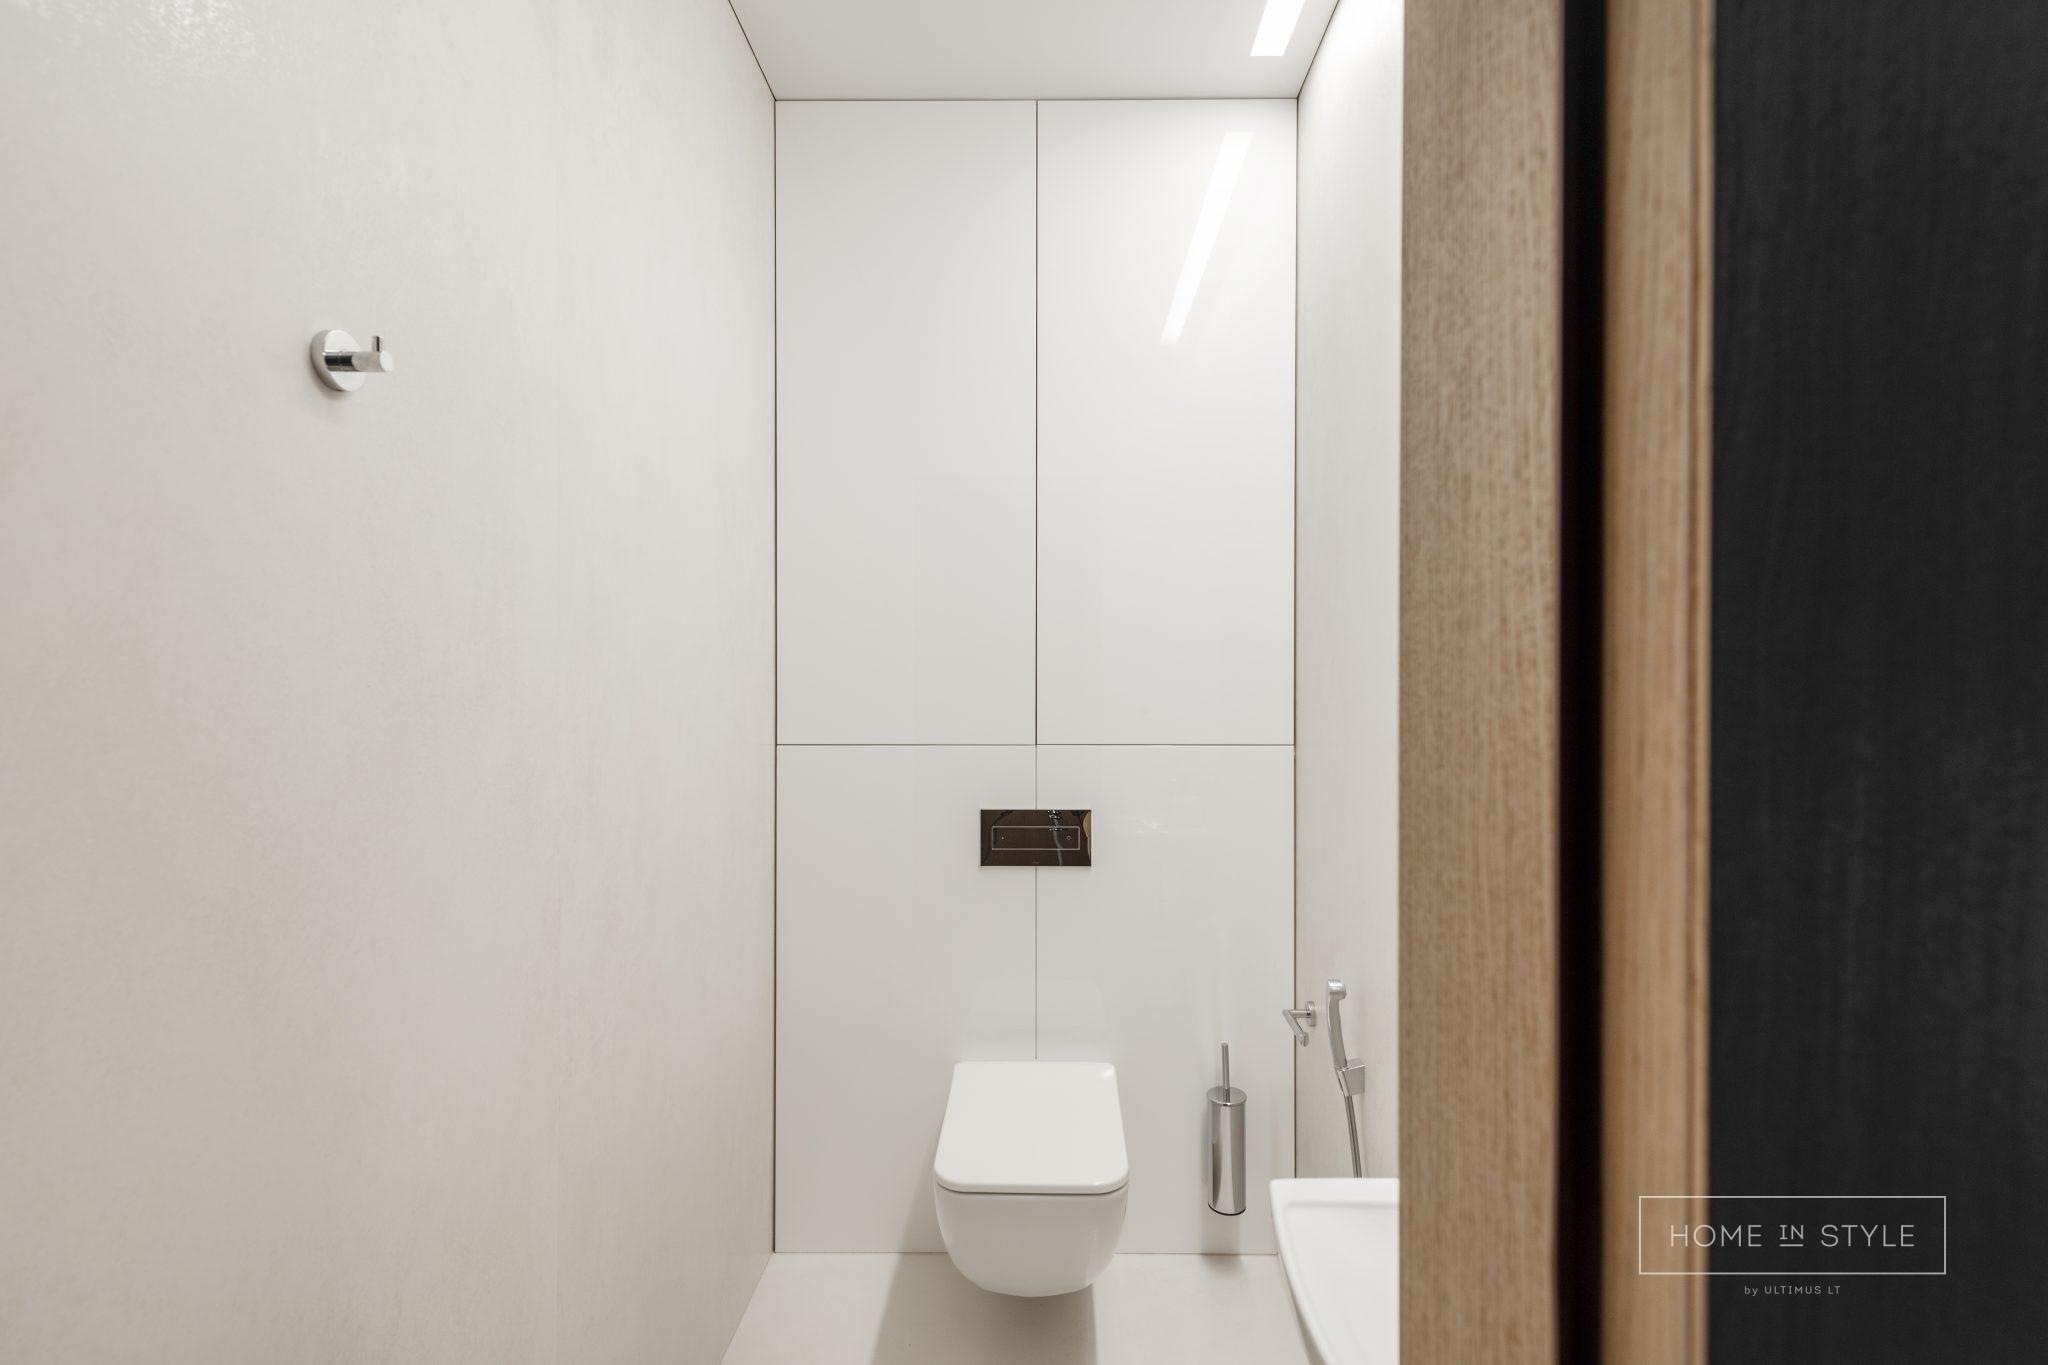 Stilingi vonios kambario baldai pagal uzsakyma